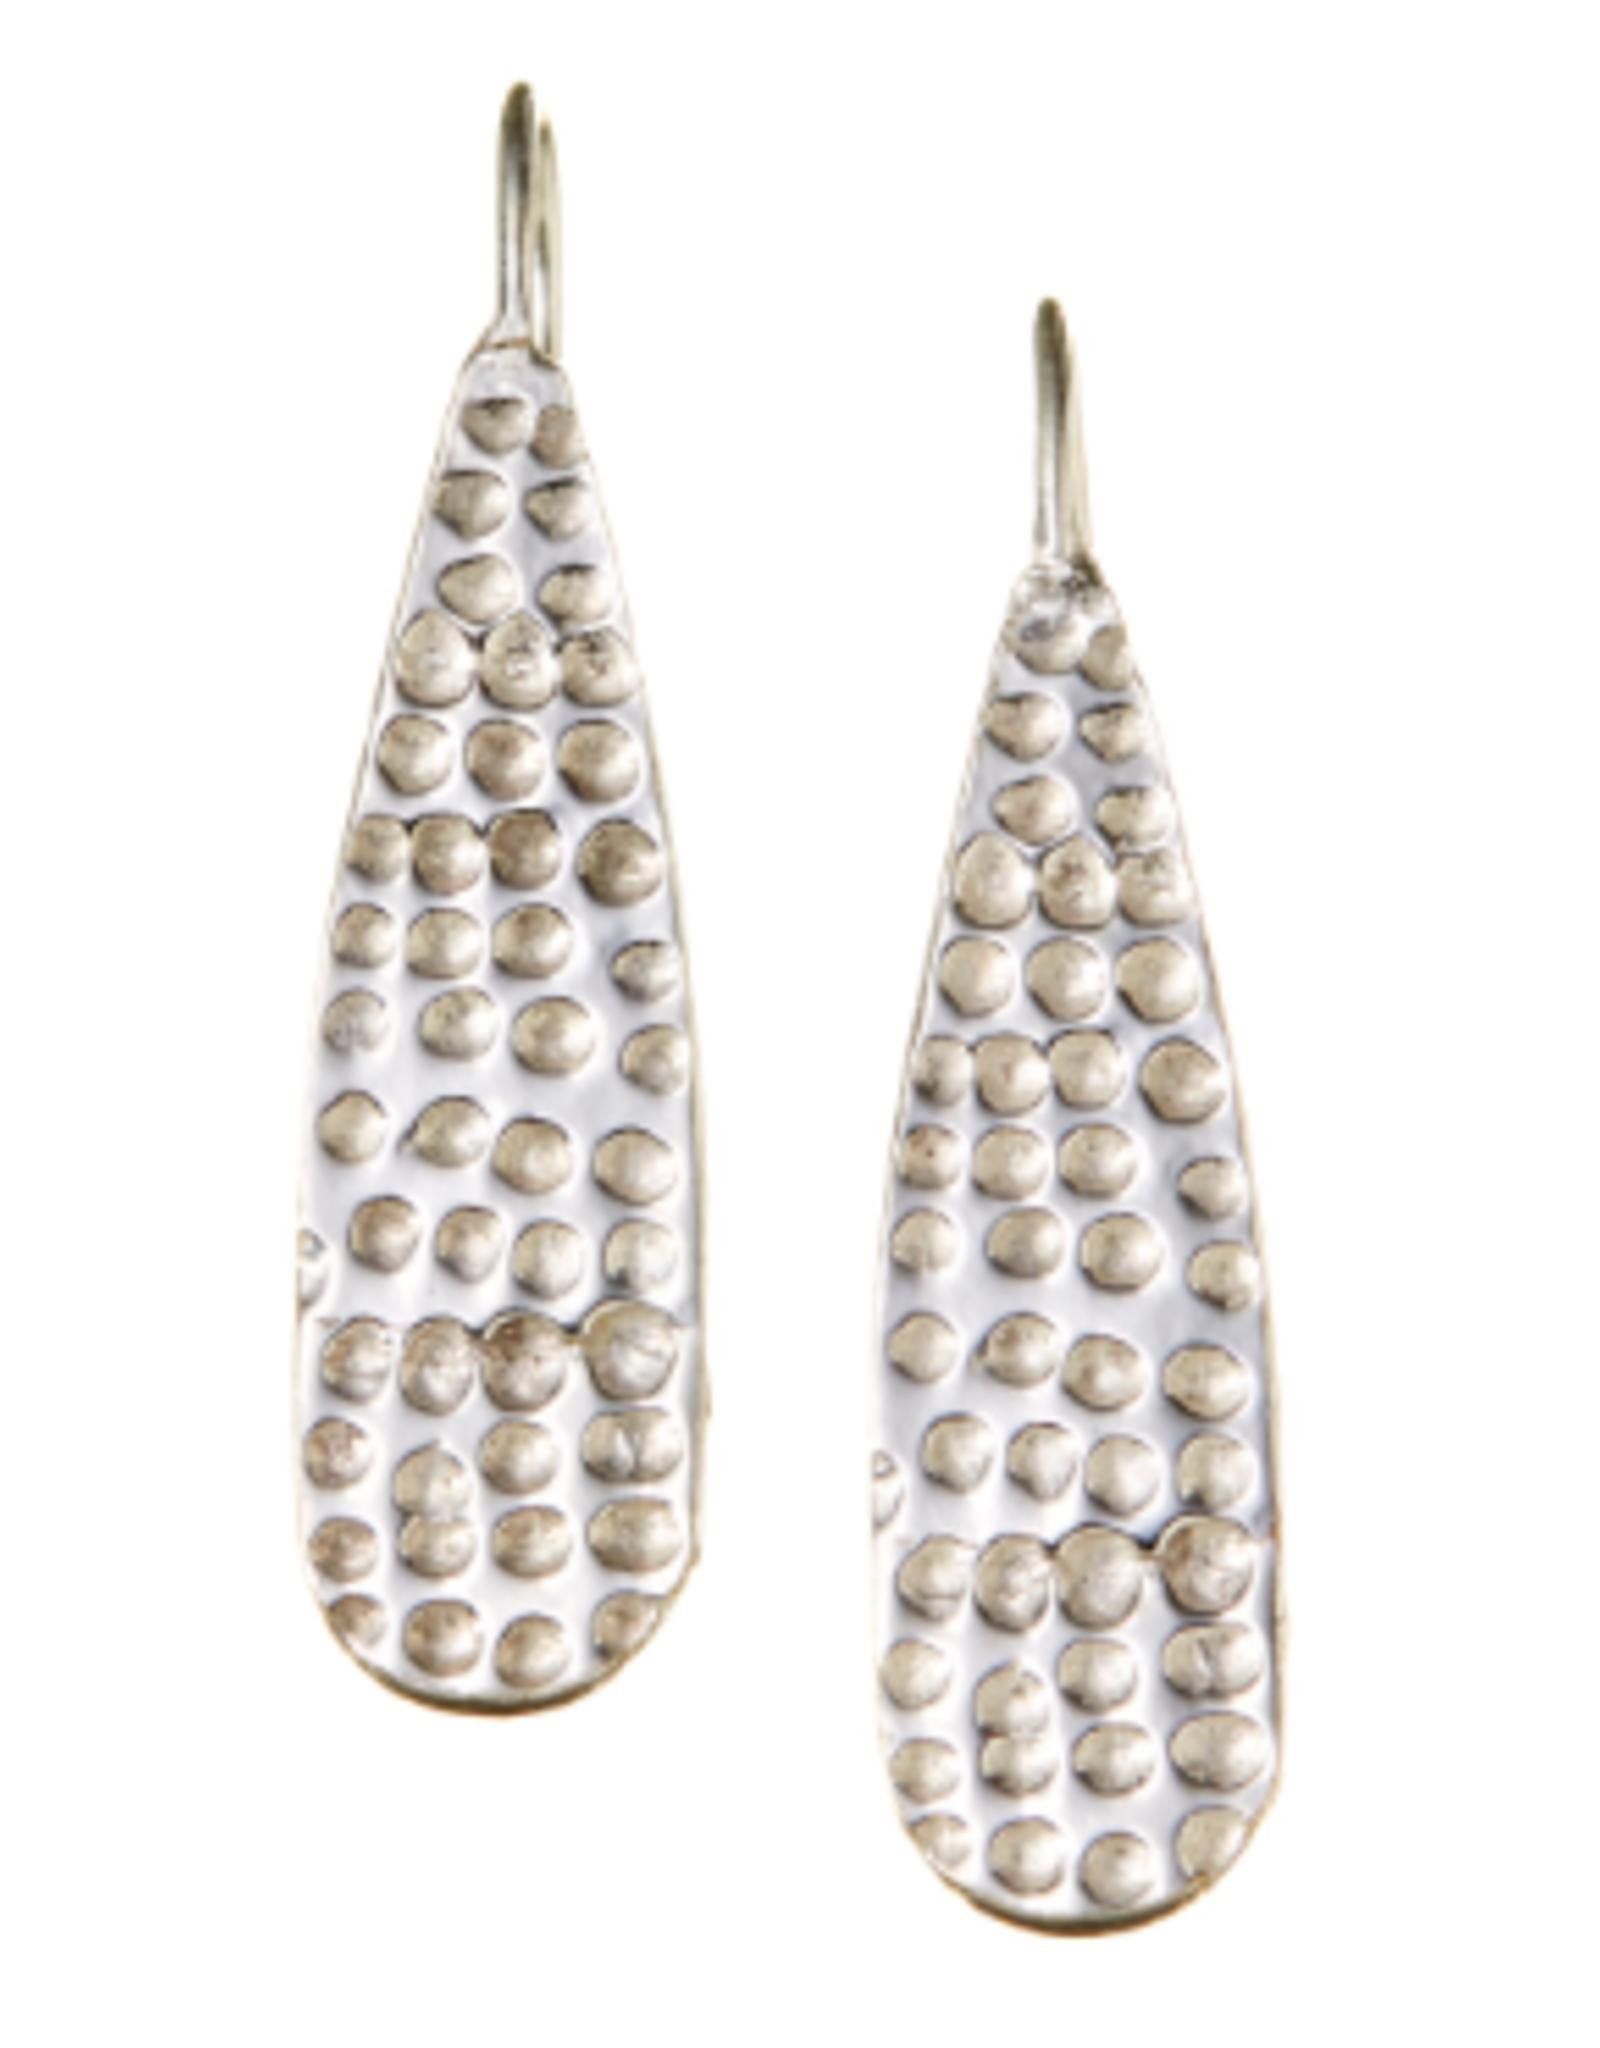 India, Silver Plated Sarala Earrings